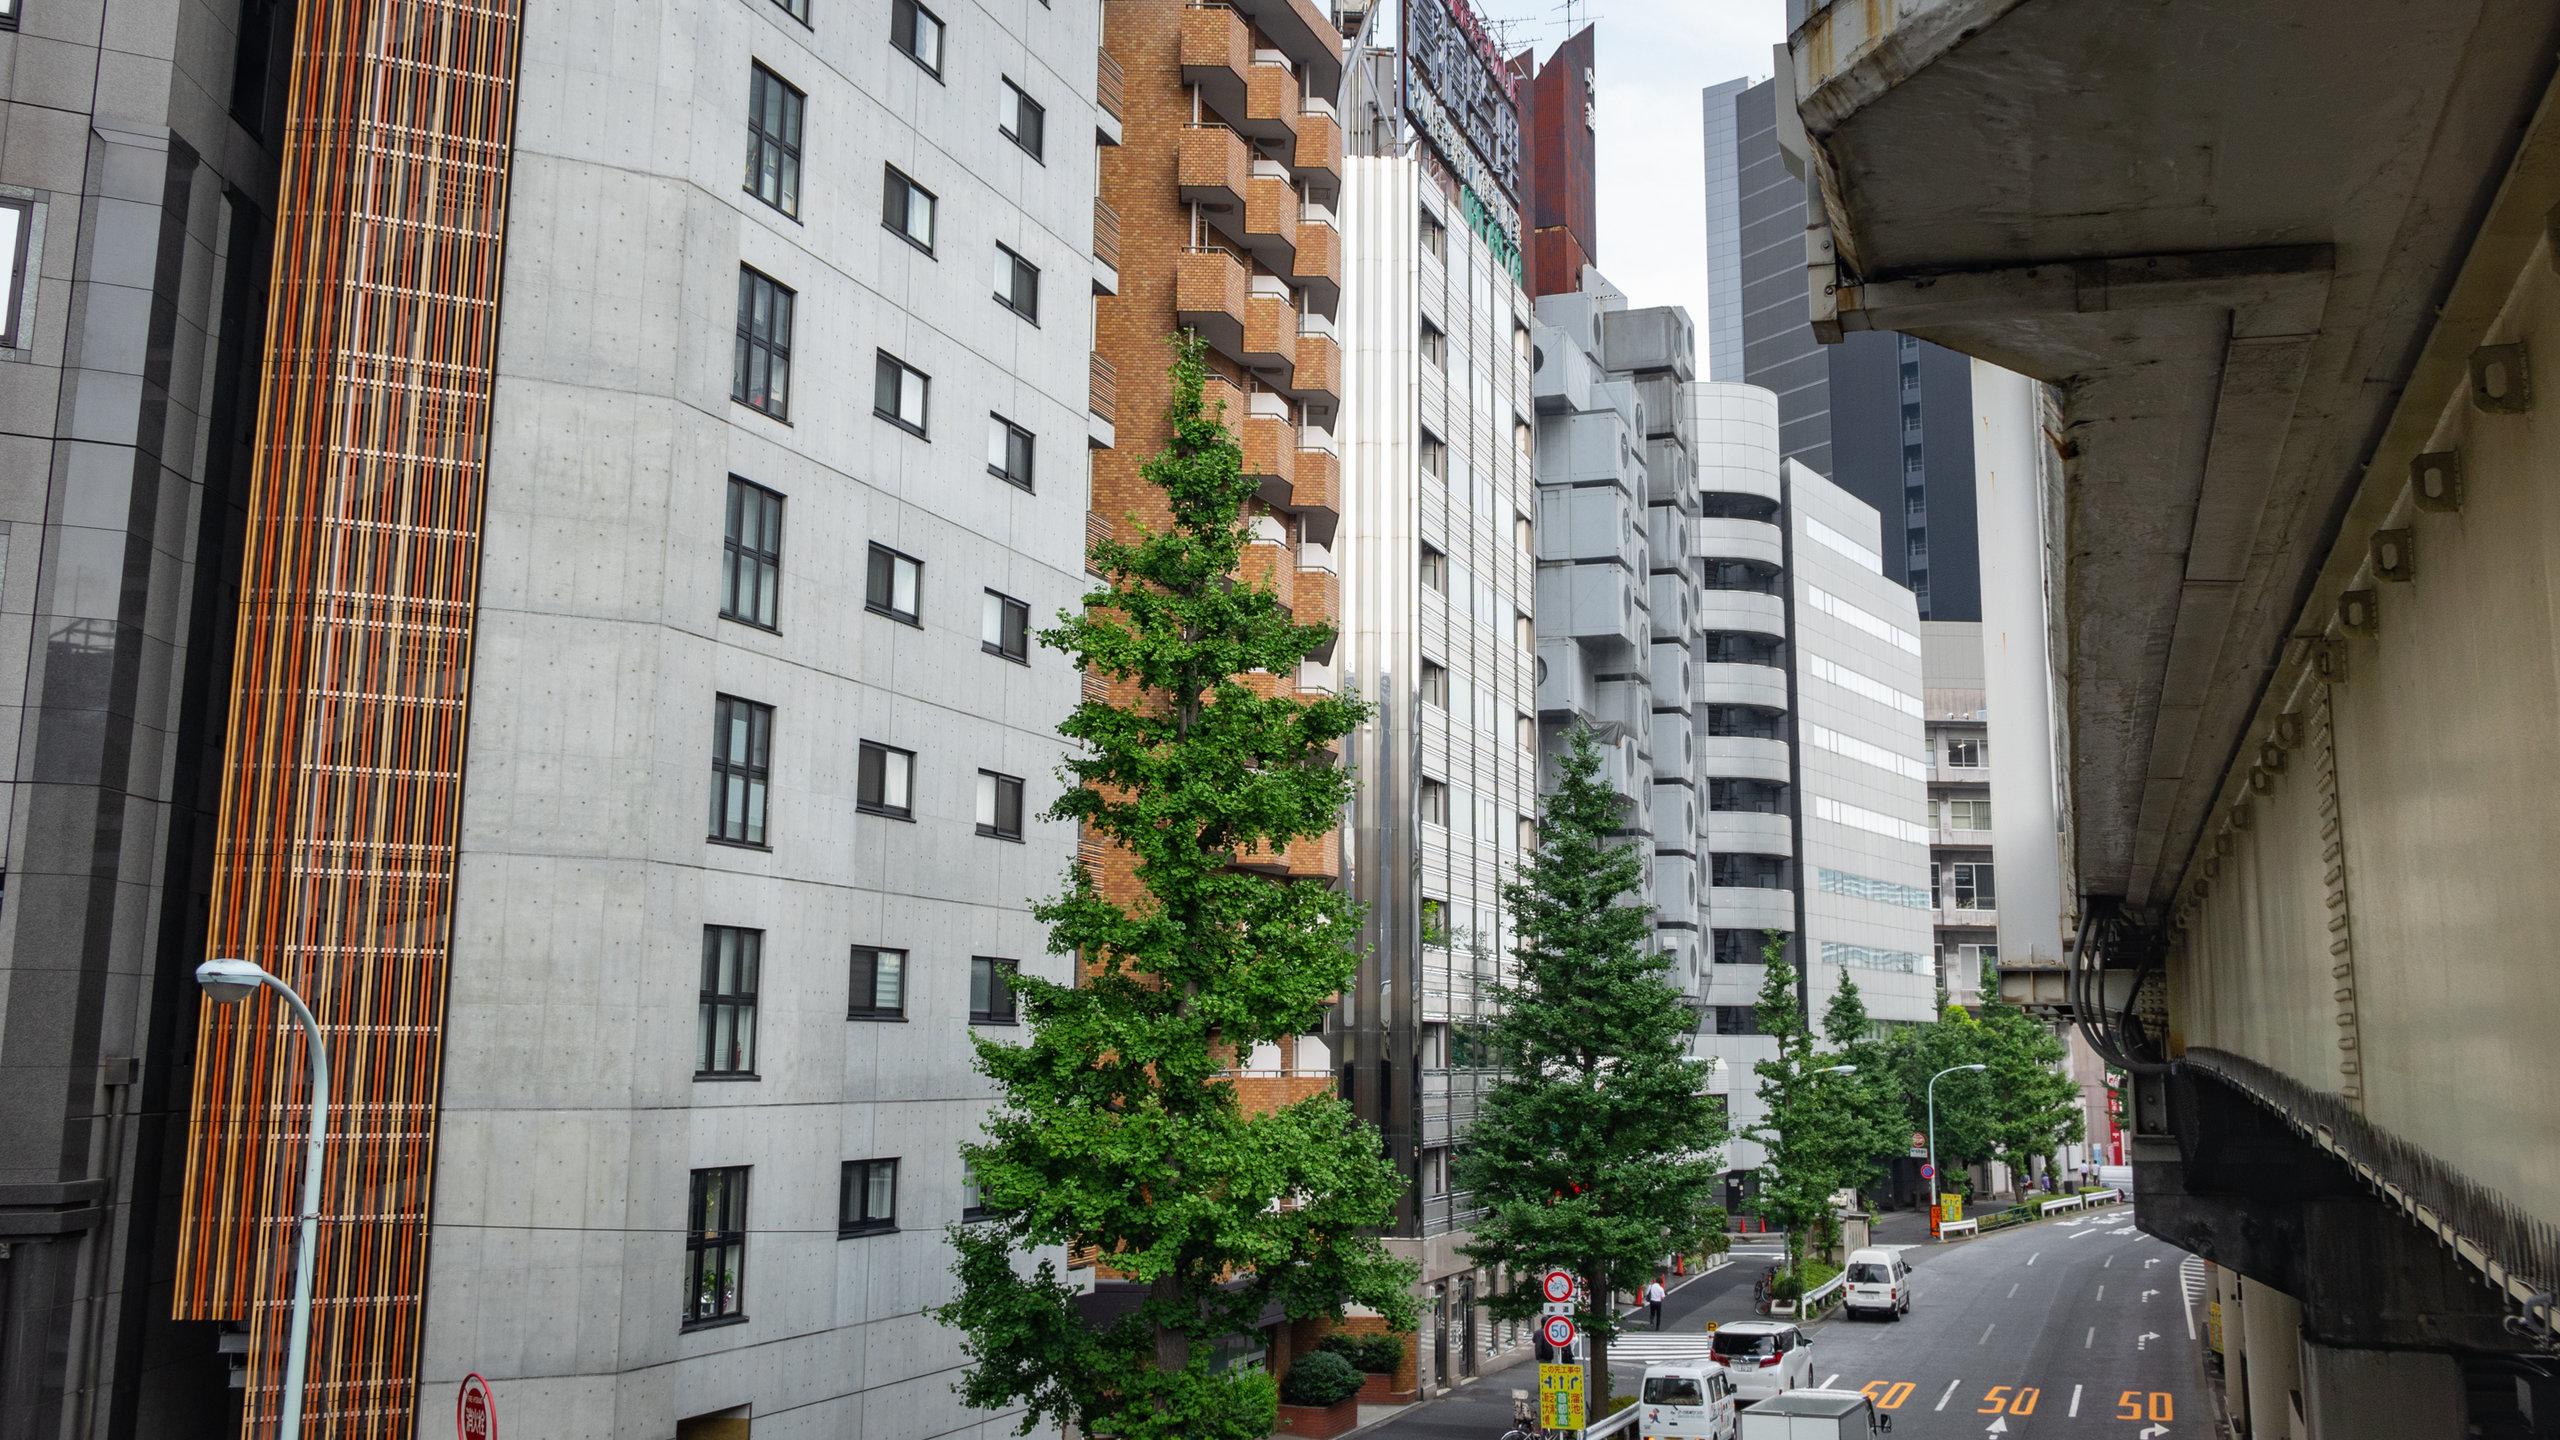 Nakagin Capsule Tower, Tokyo, Tokyo Prefecture, Japan